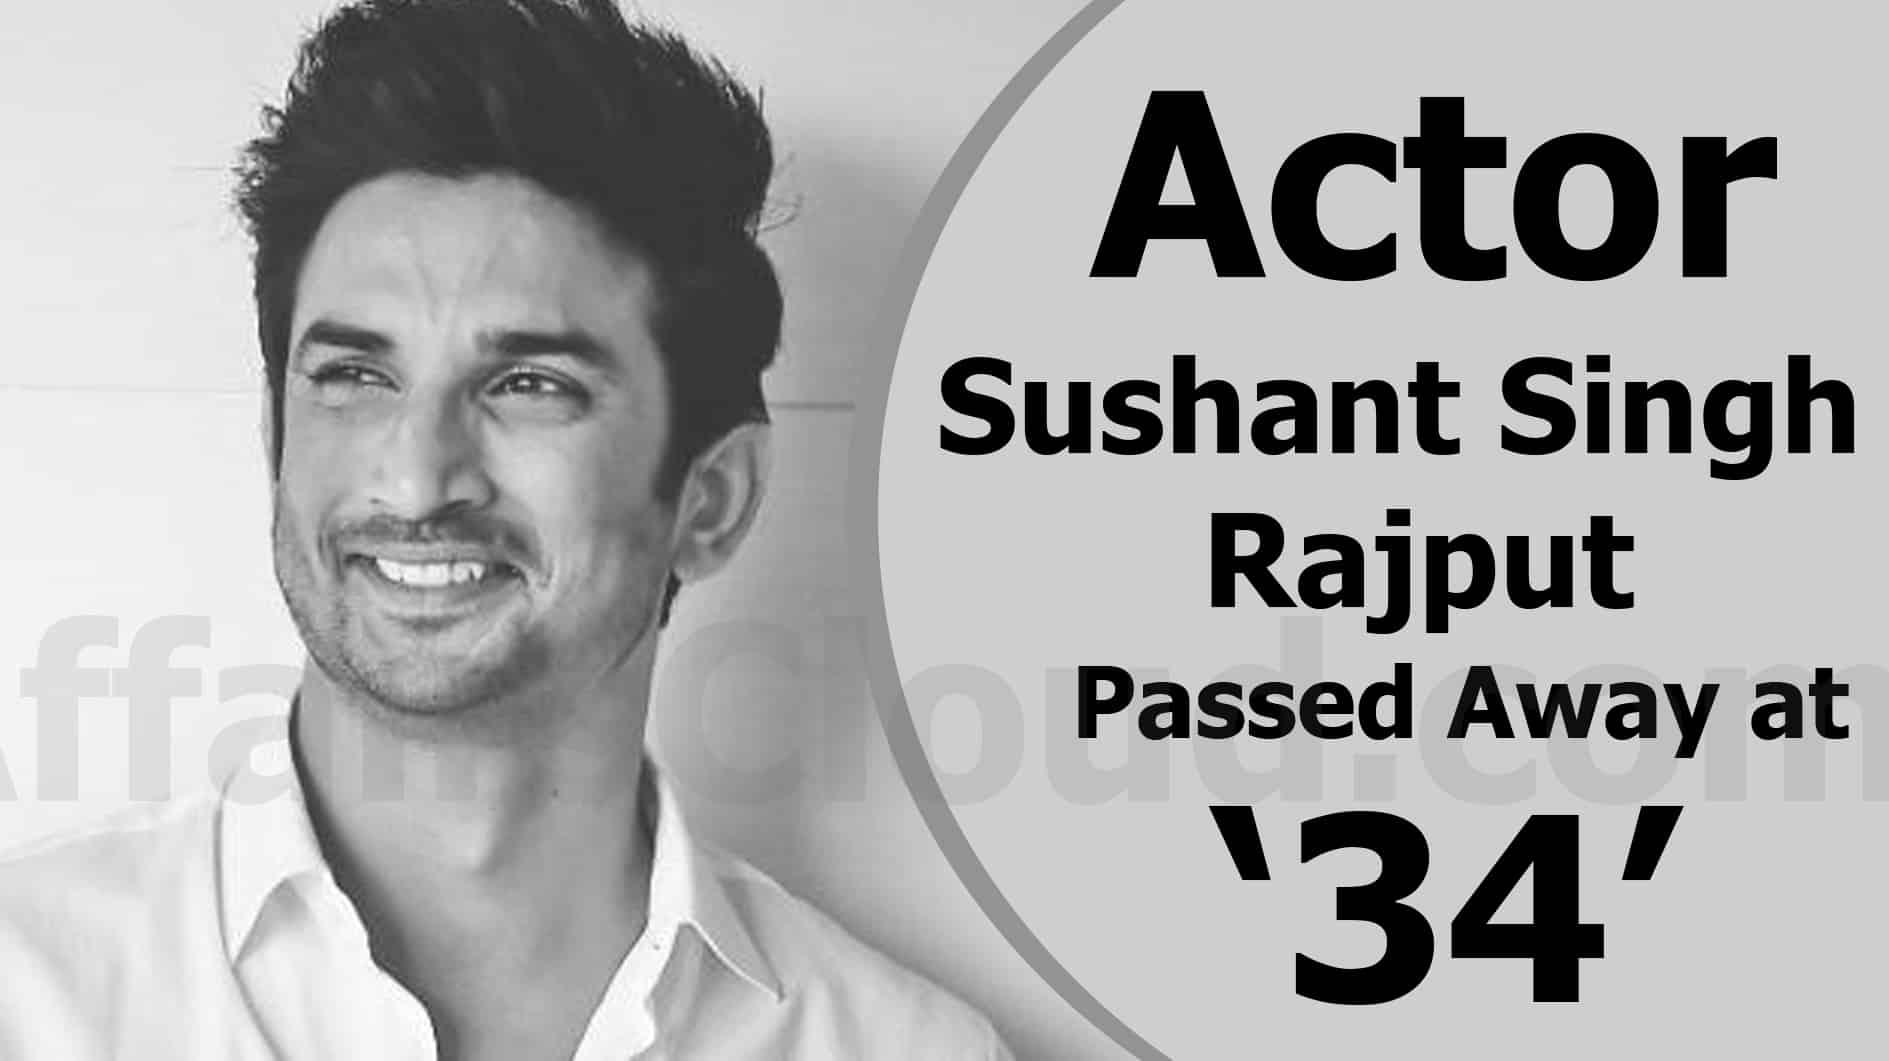 Actor-Sushant-Singh-Rajput